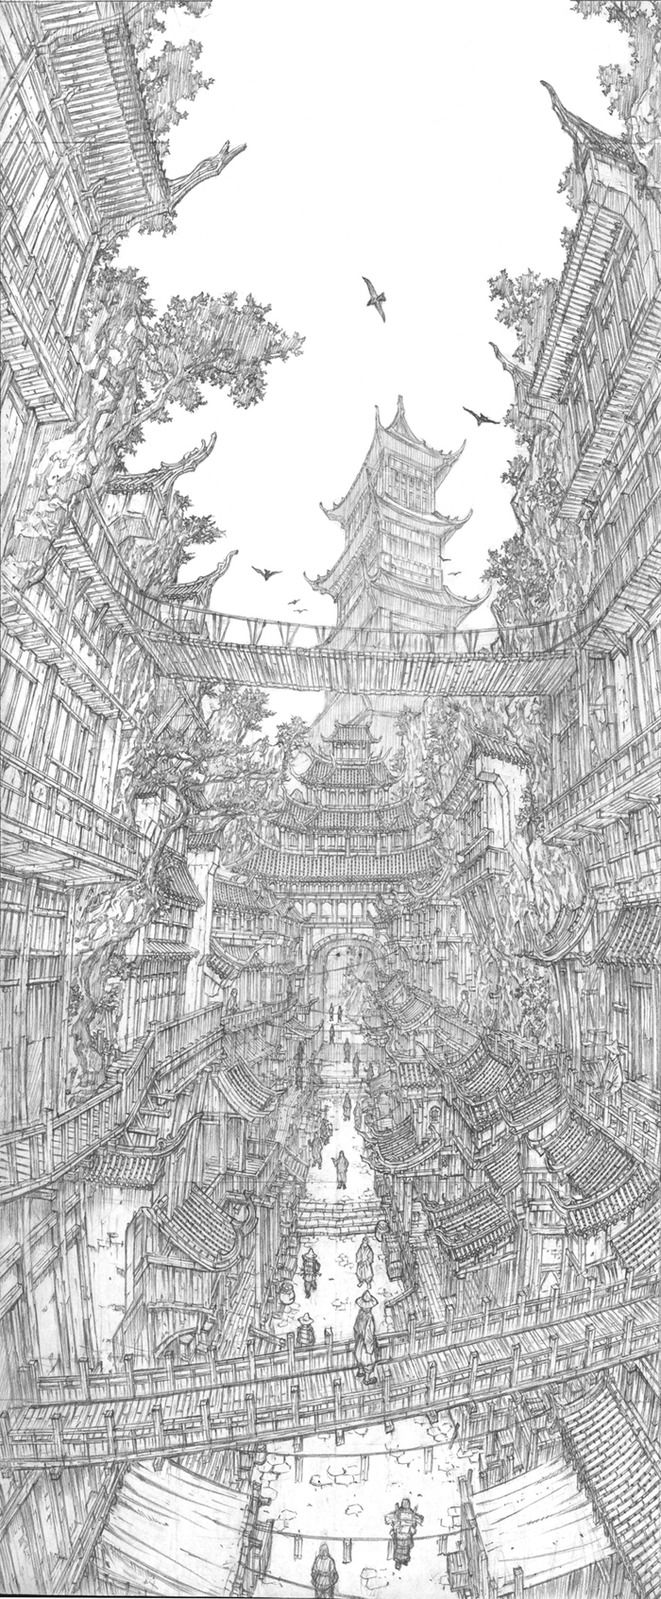 Chengdu by jungmin - Minseub Jung - CGHUB ✤ || CHARACTER DESIGN REFERENCES | キャラクターデザイン | çizgi film • Find more at https://www.facebook.com/CharacterDesignReferences & http://www.pinterest.com/characterdesigh if you're looking for: bande dessinée, dessin animé #animation #banda #desenhada #toons #manga #BD #historieta #sketch #how #to #draw #strip #fumetto #settei #fumetti #manhwa #cartoni #animati #comics #cartoon || ✤